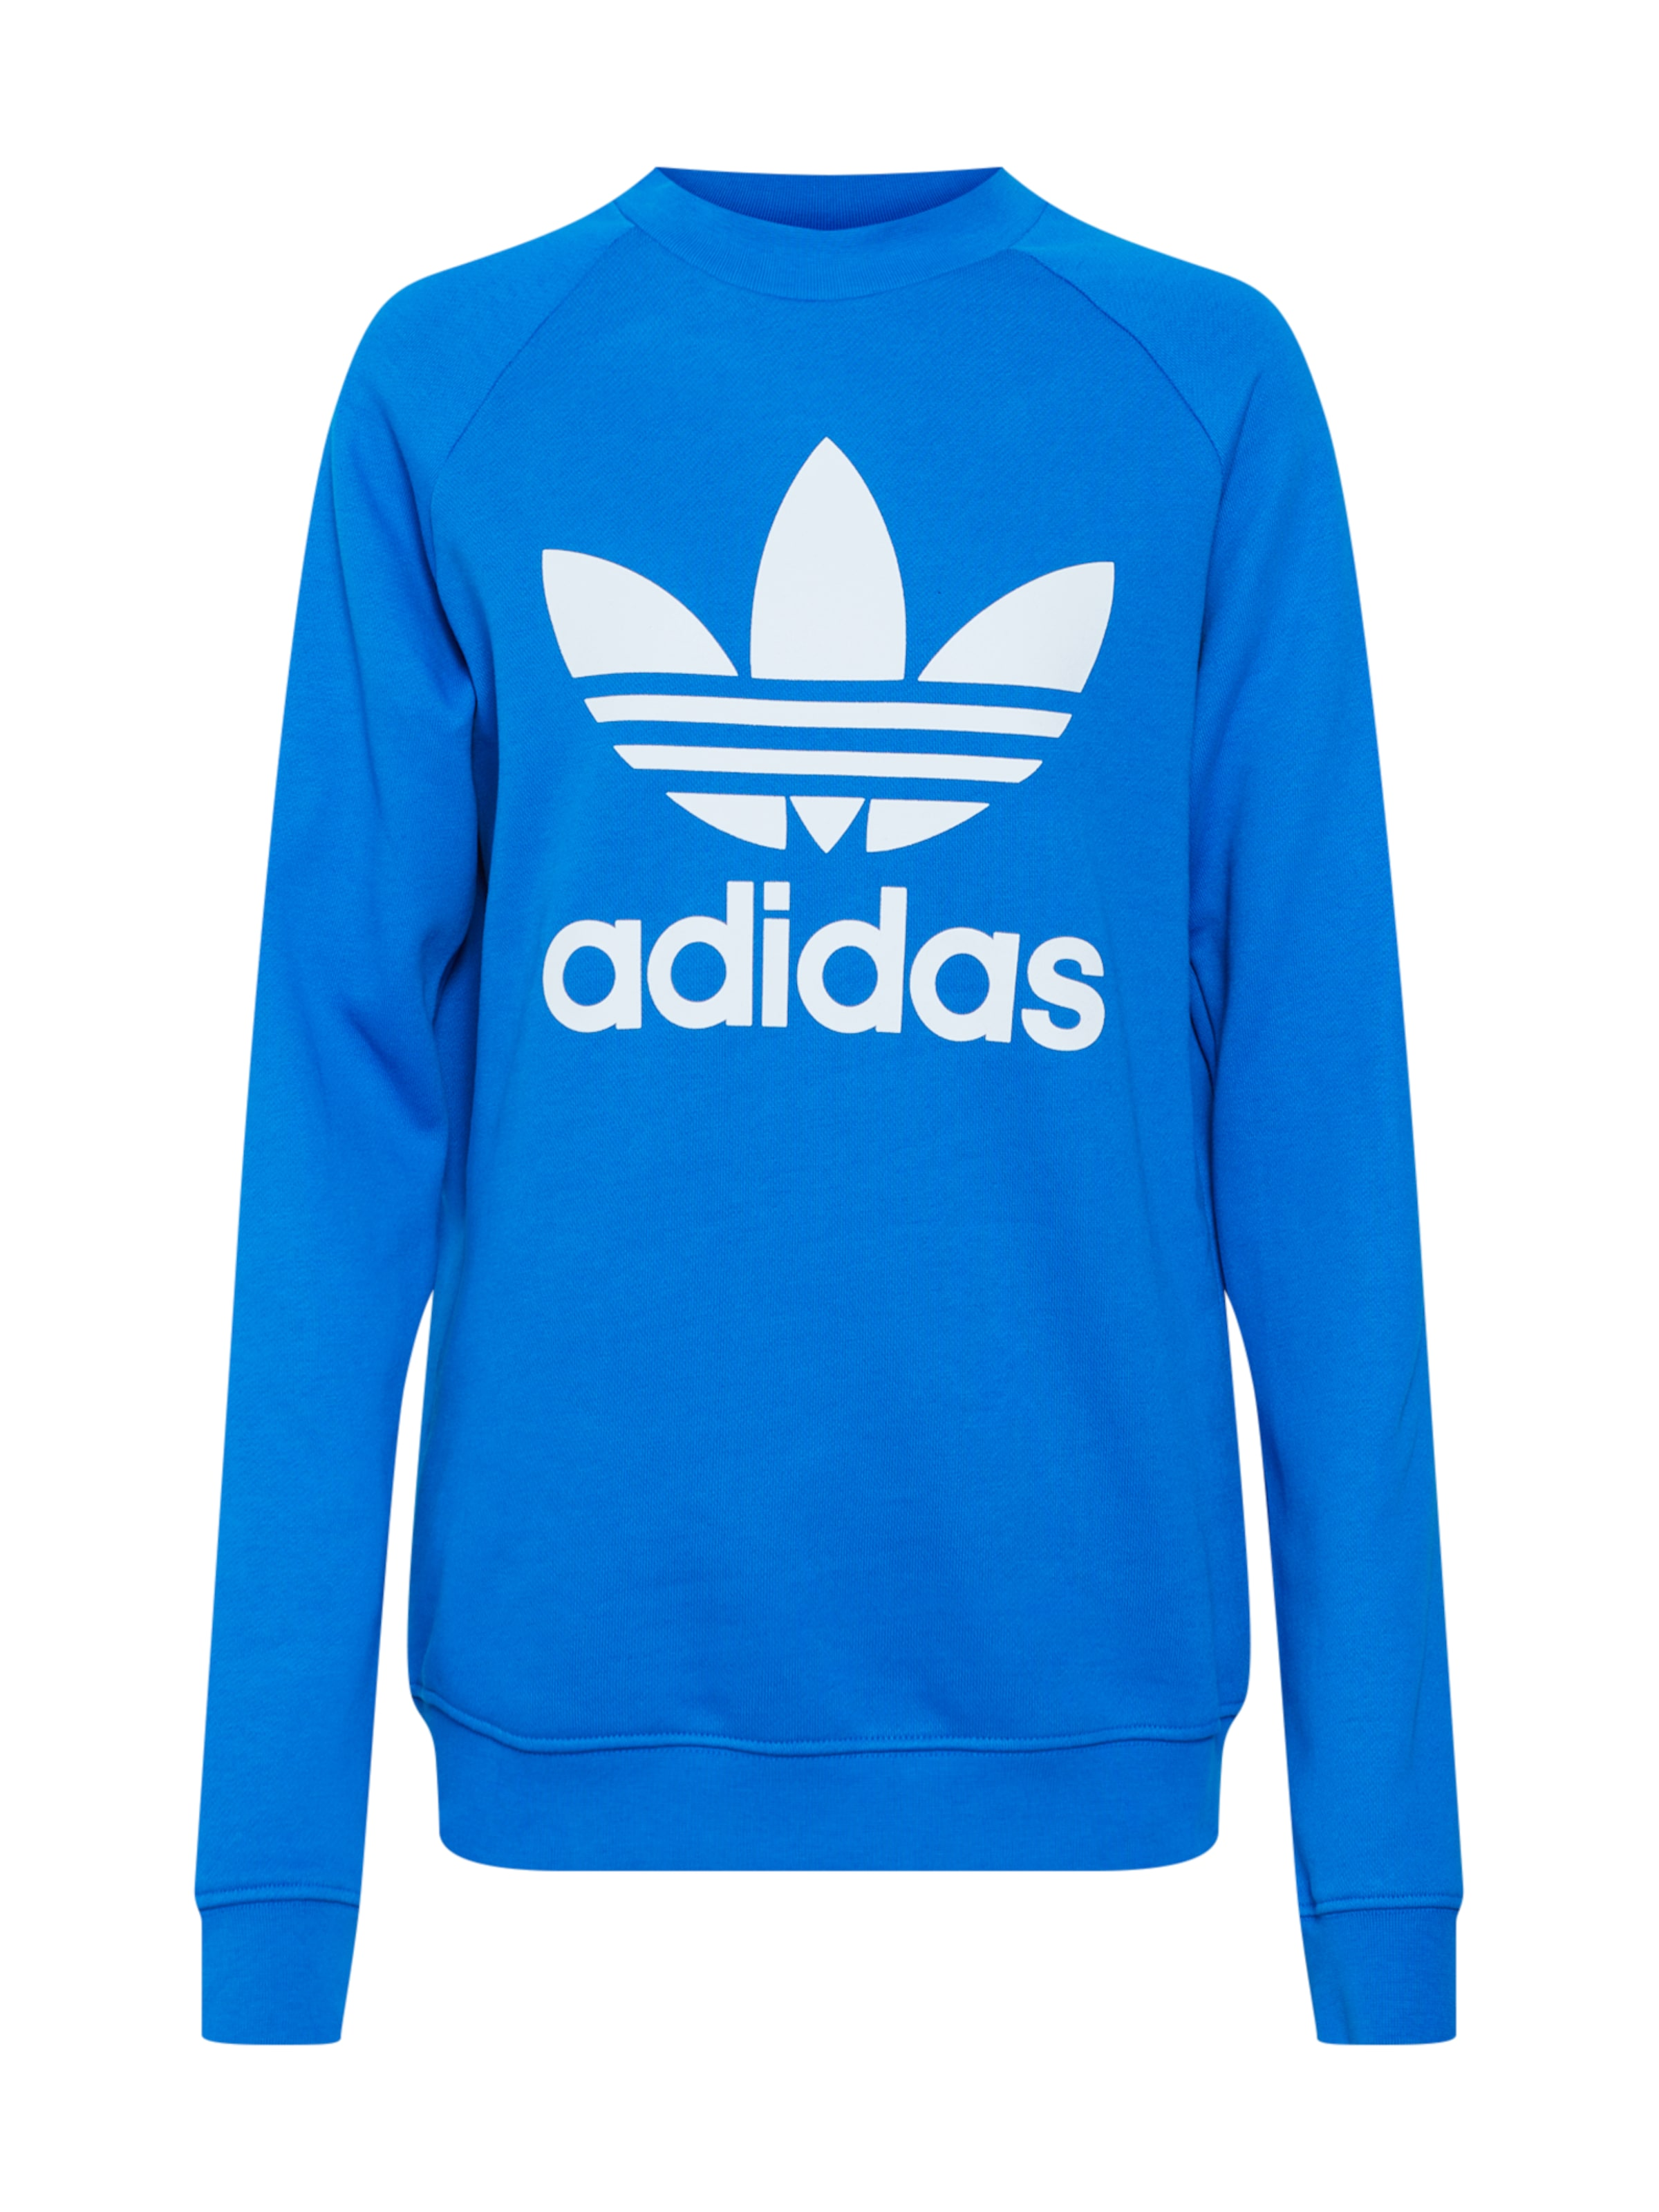 Adidas Sweatshirt Originals RoyalblauWeiß Sweatshirt In In Originals Adidas N8v0mOnw